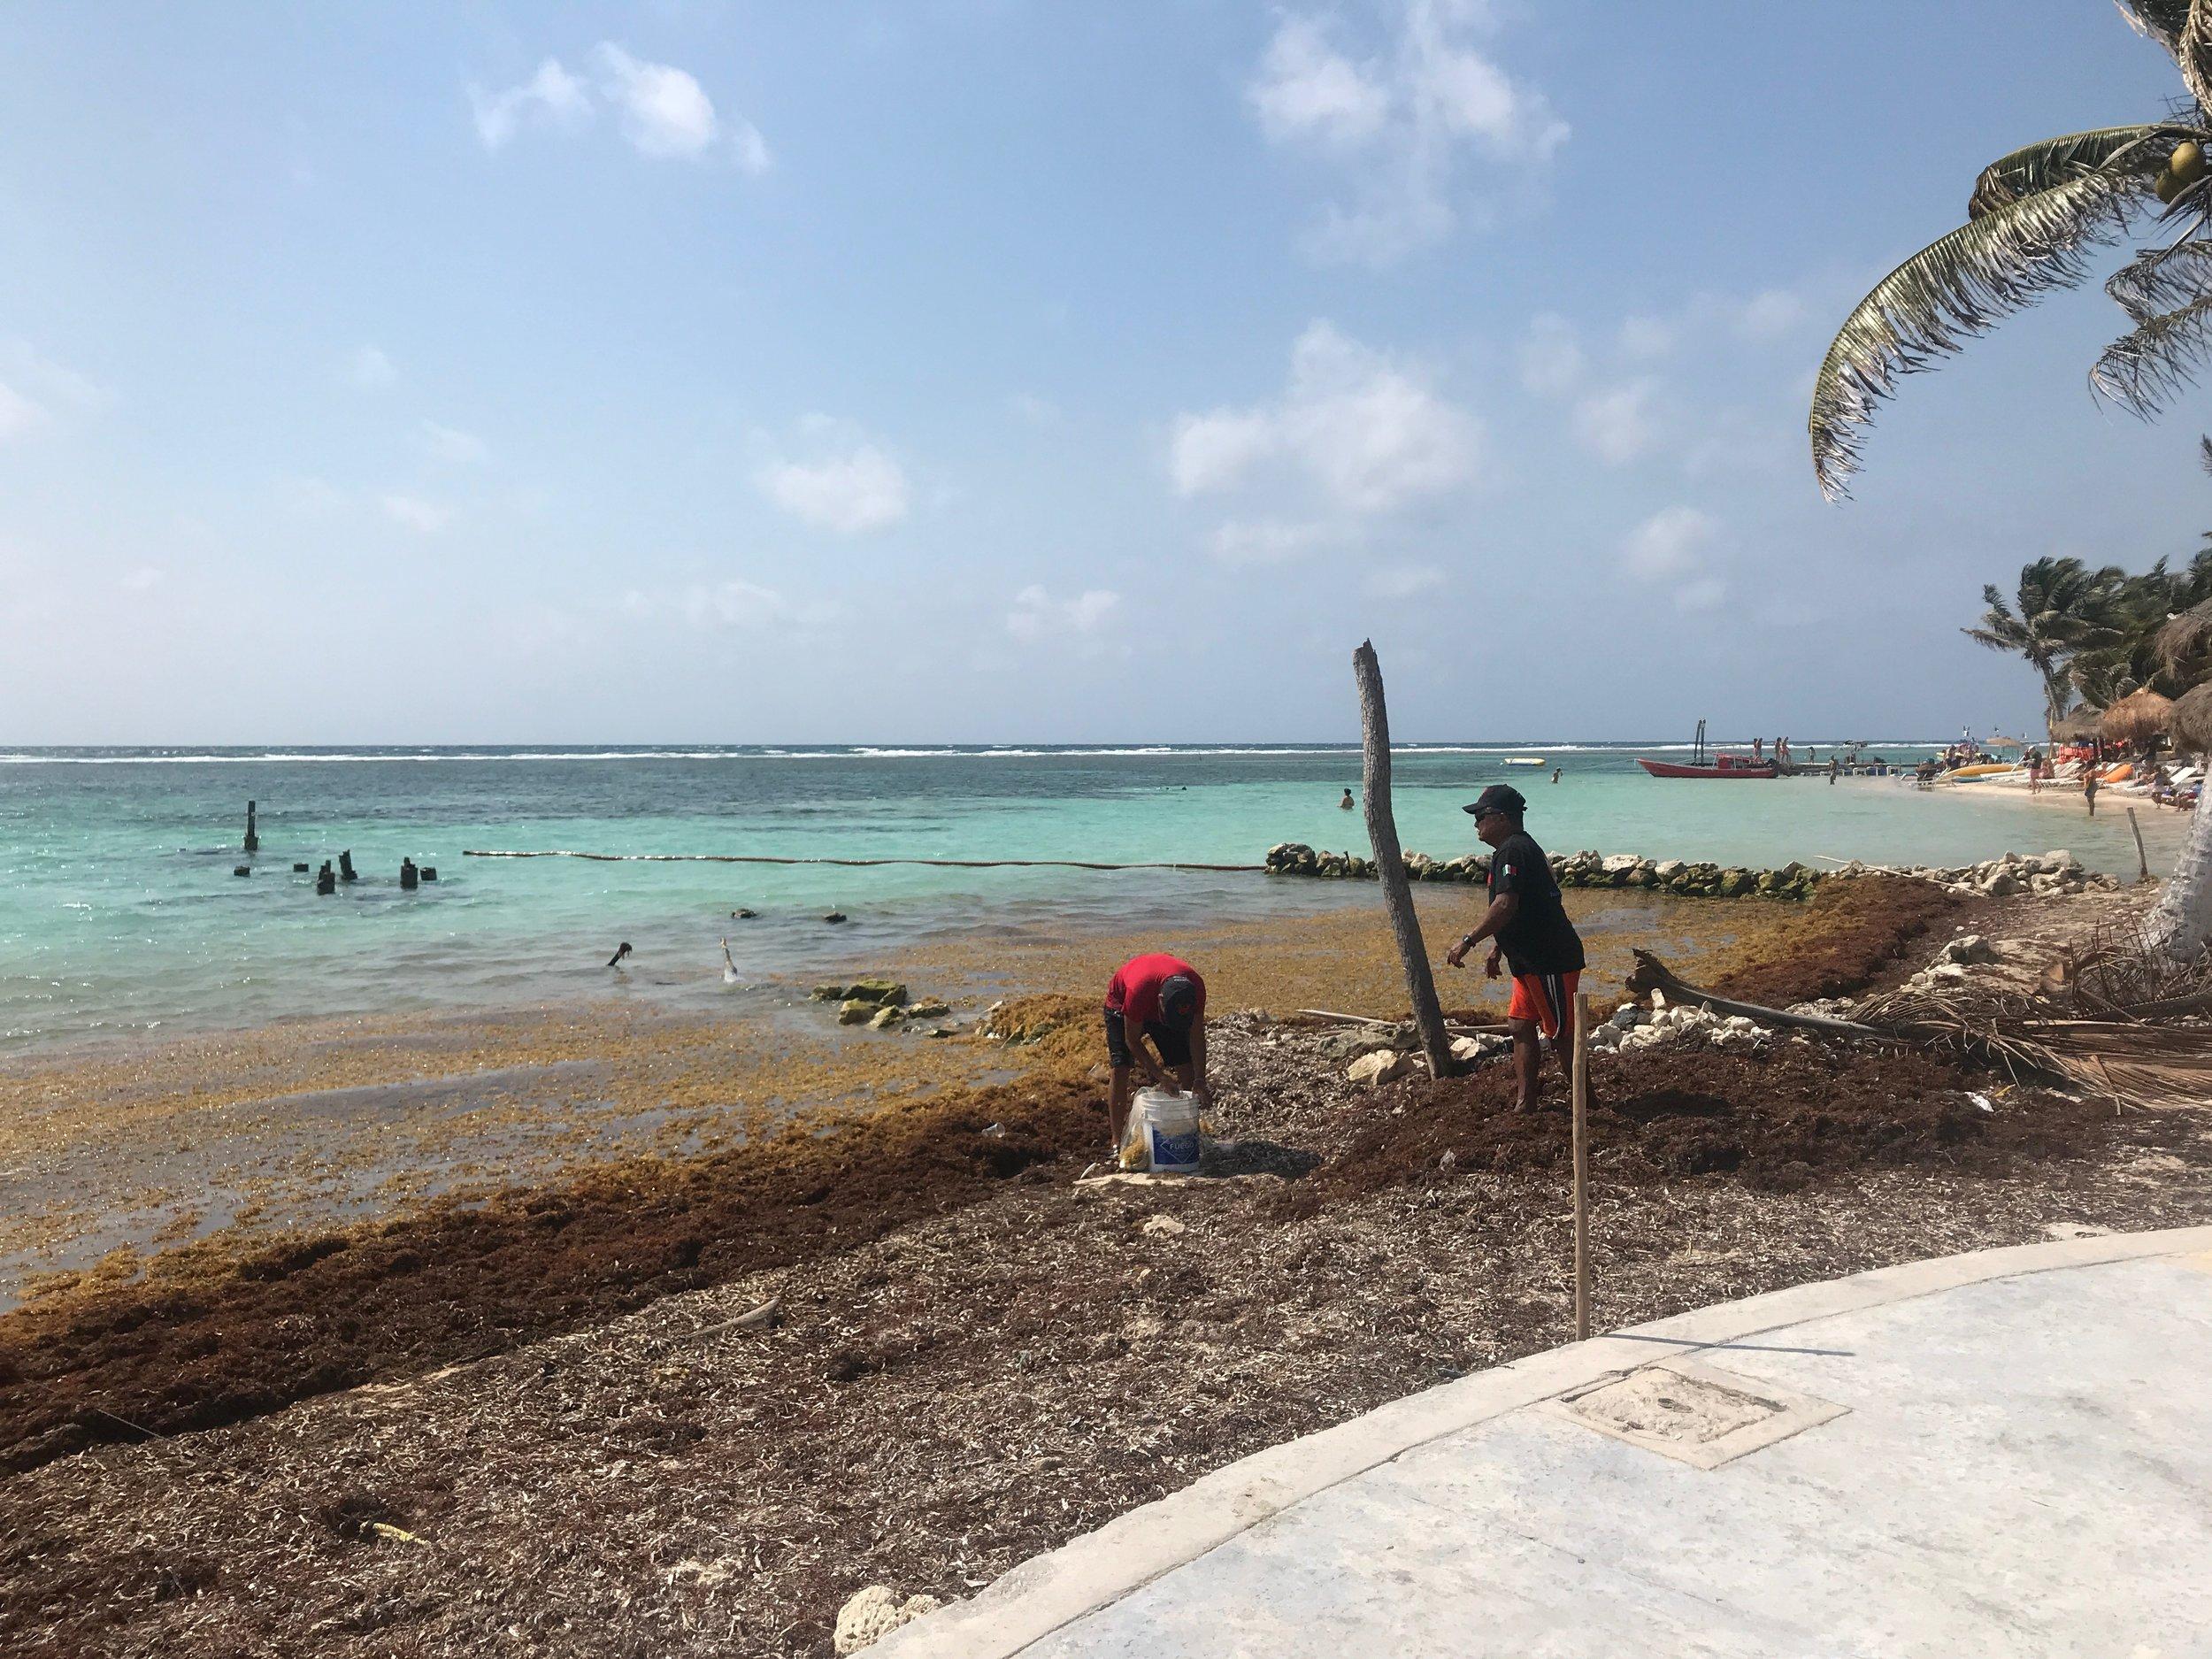 Village fishermen